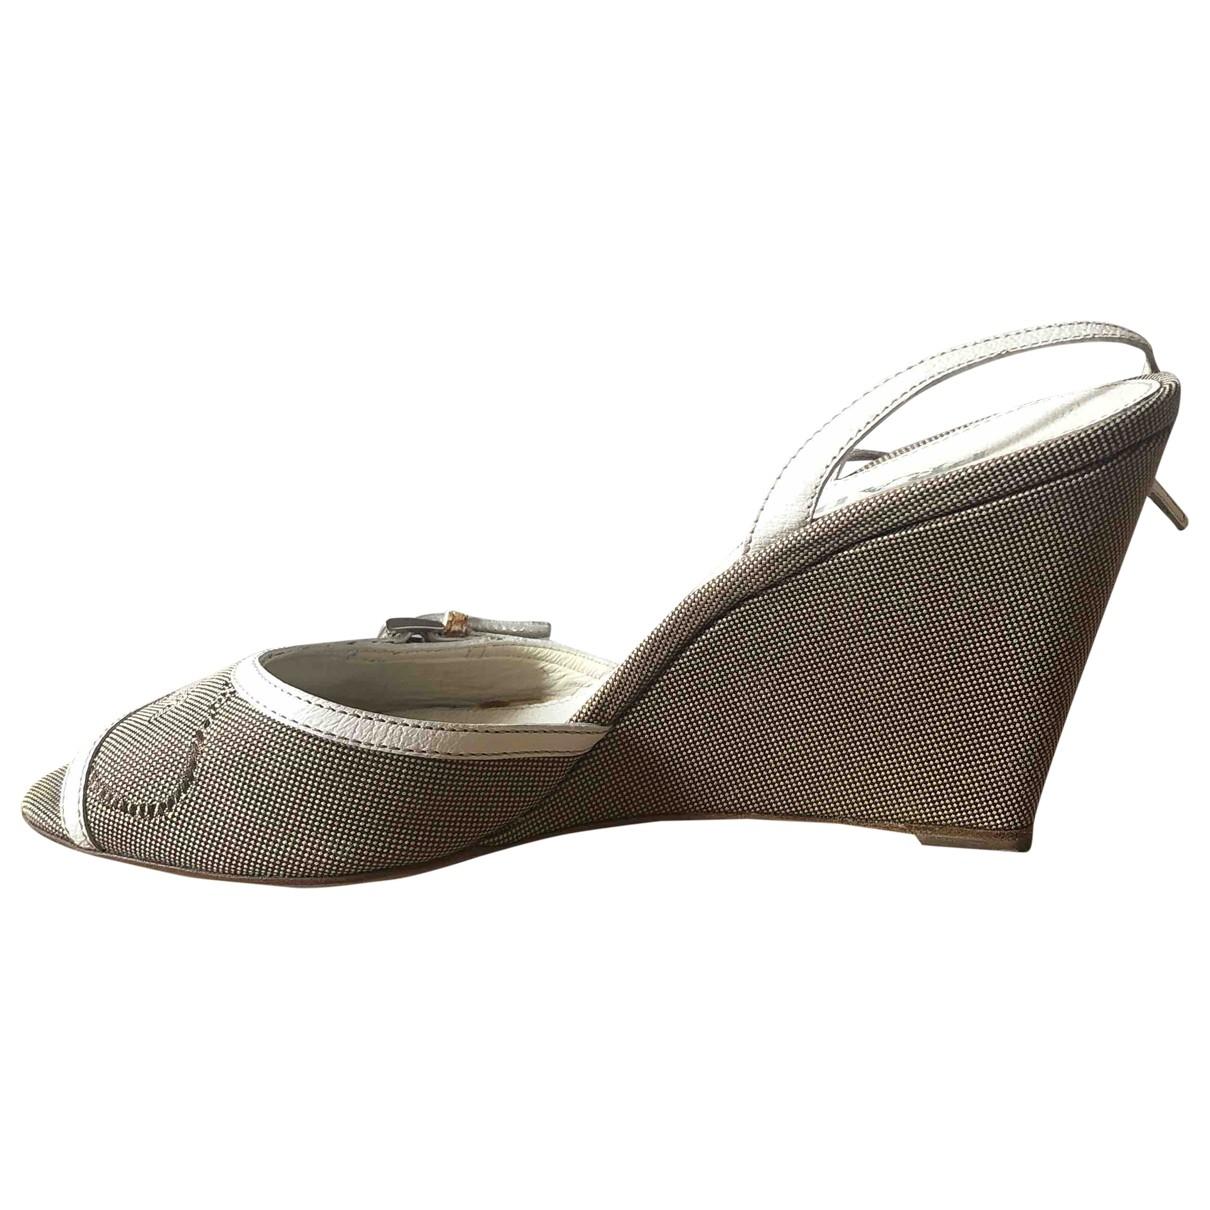 Prada \N Beige Cloth Sandals for Women 39 EU